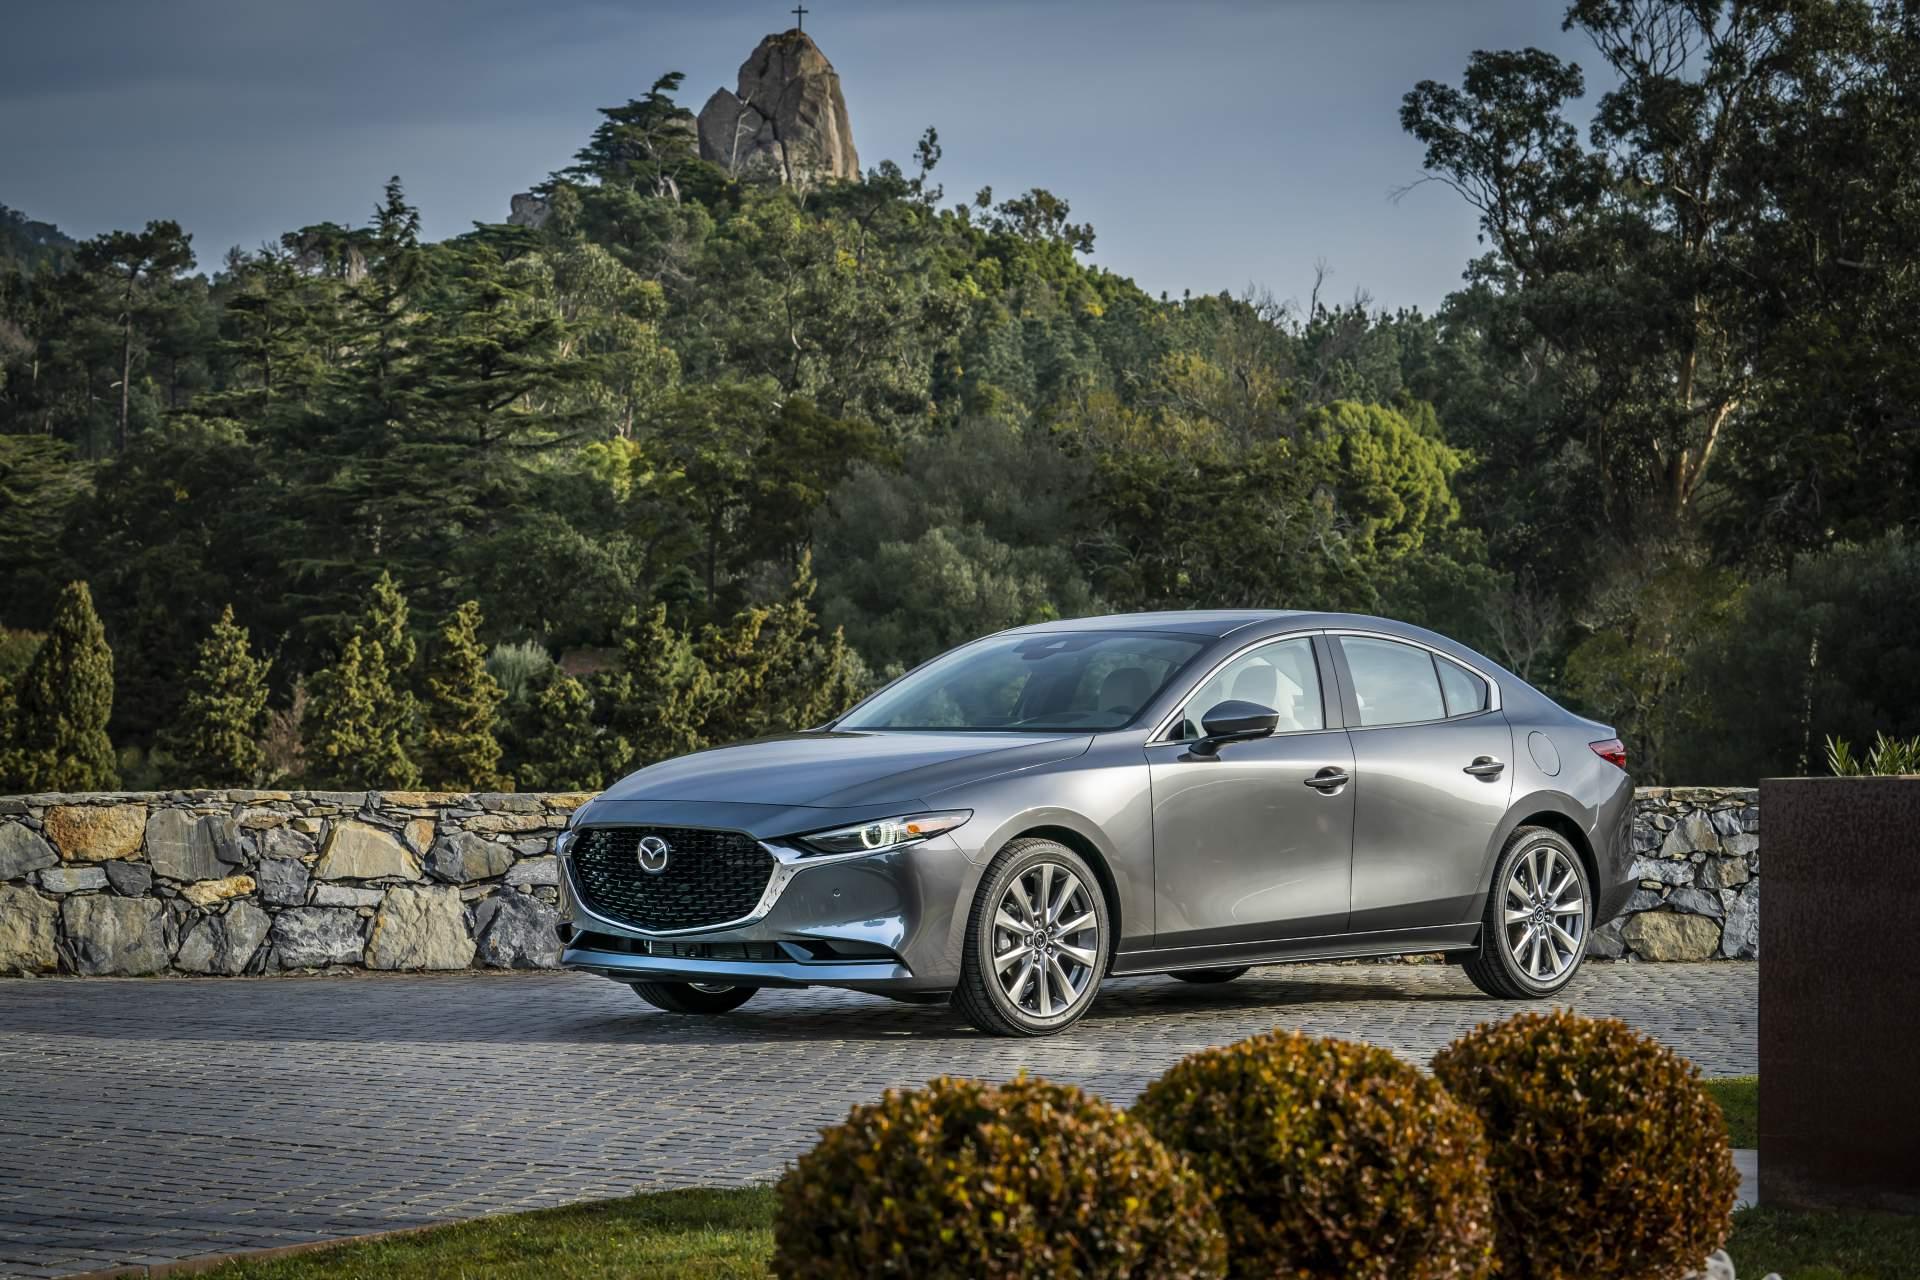 Kelebihan Mazda 4 Harga